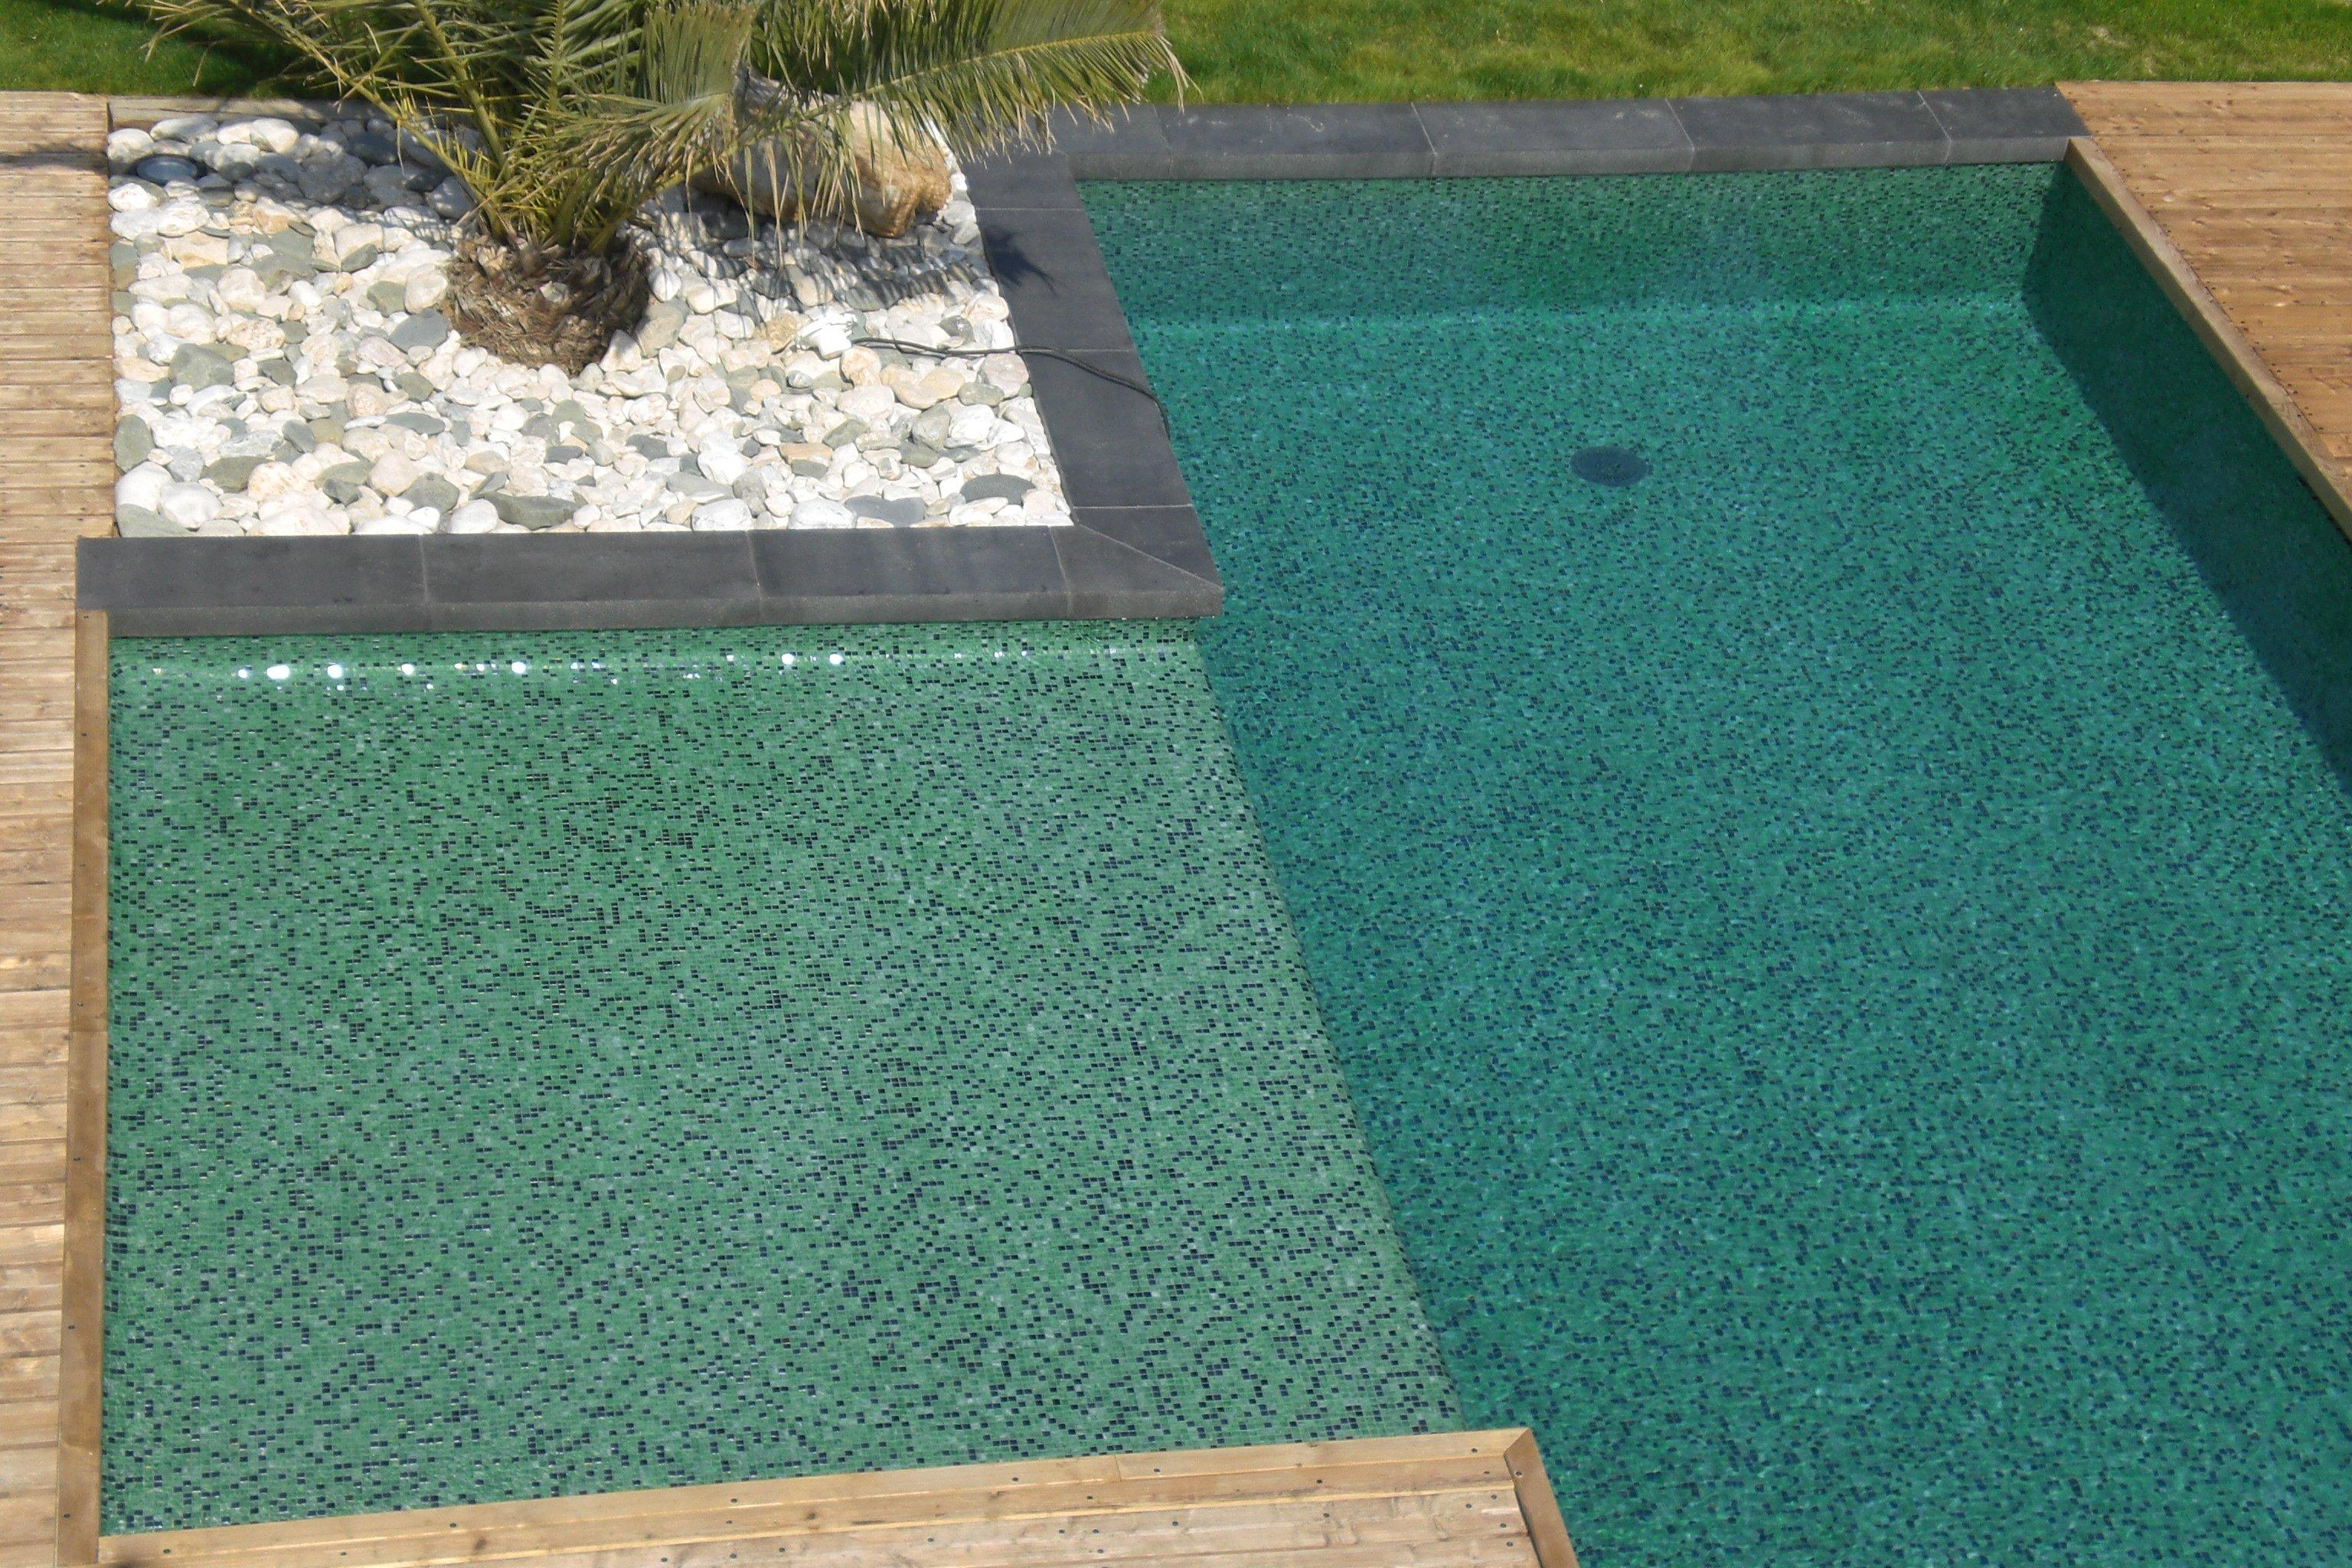 Dolce mosaic photos piscines en p tes de verre for Carreler une piscine